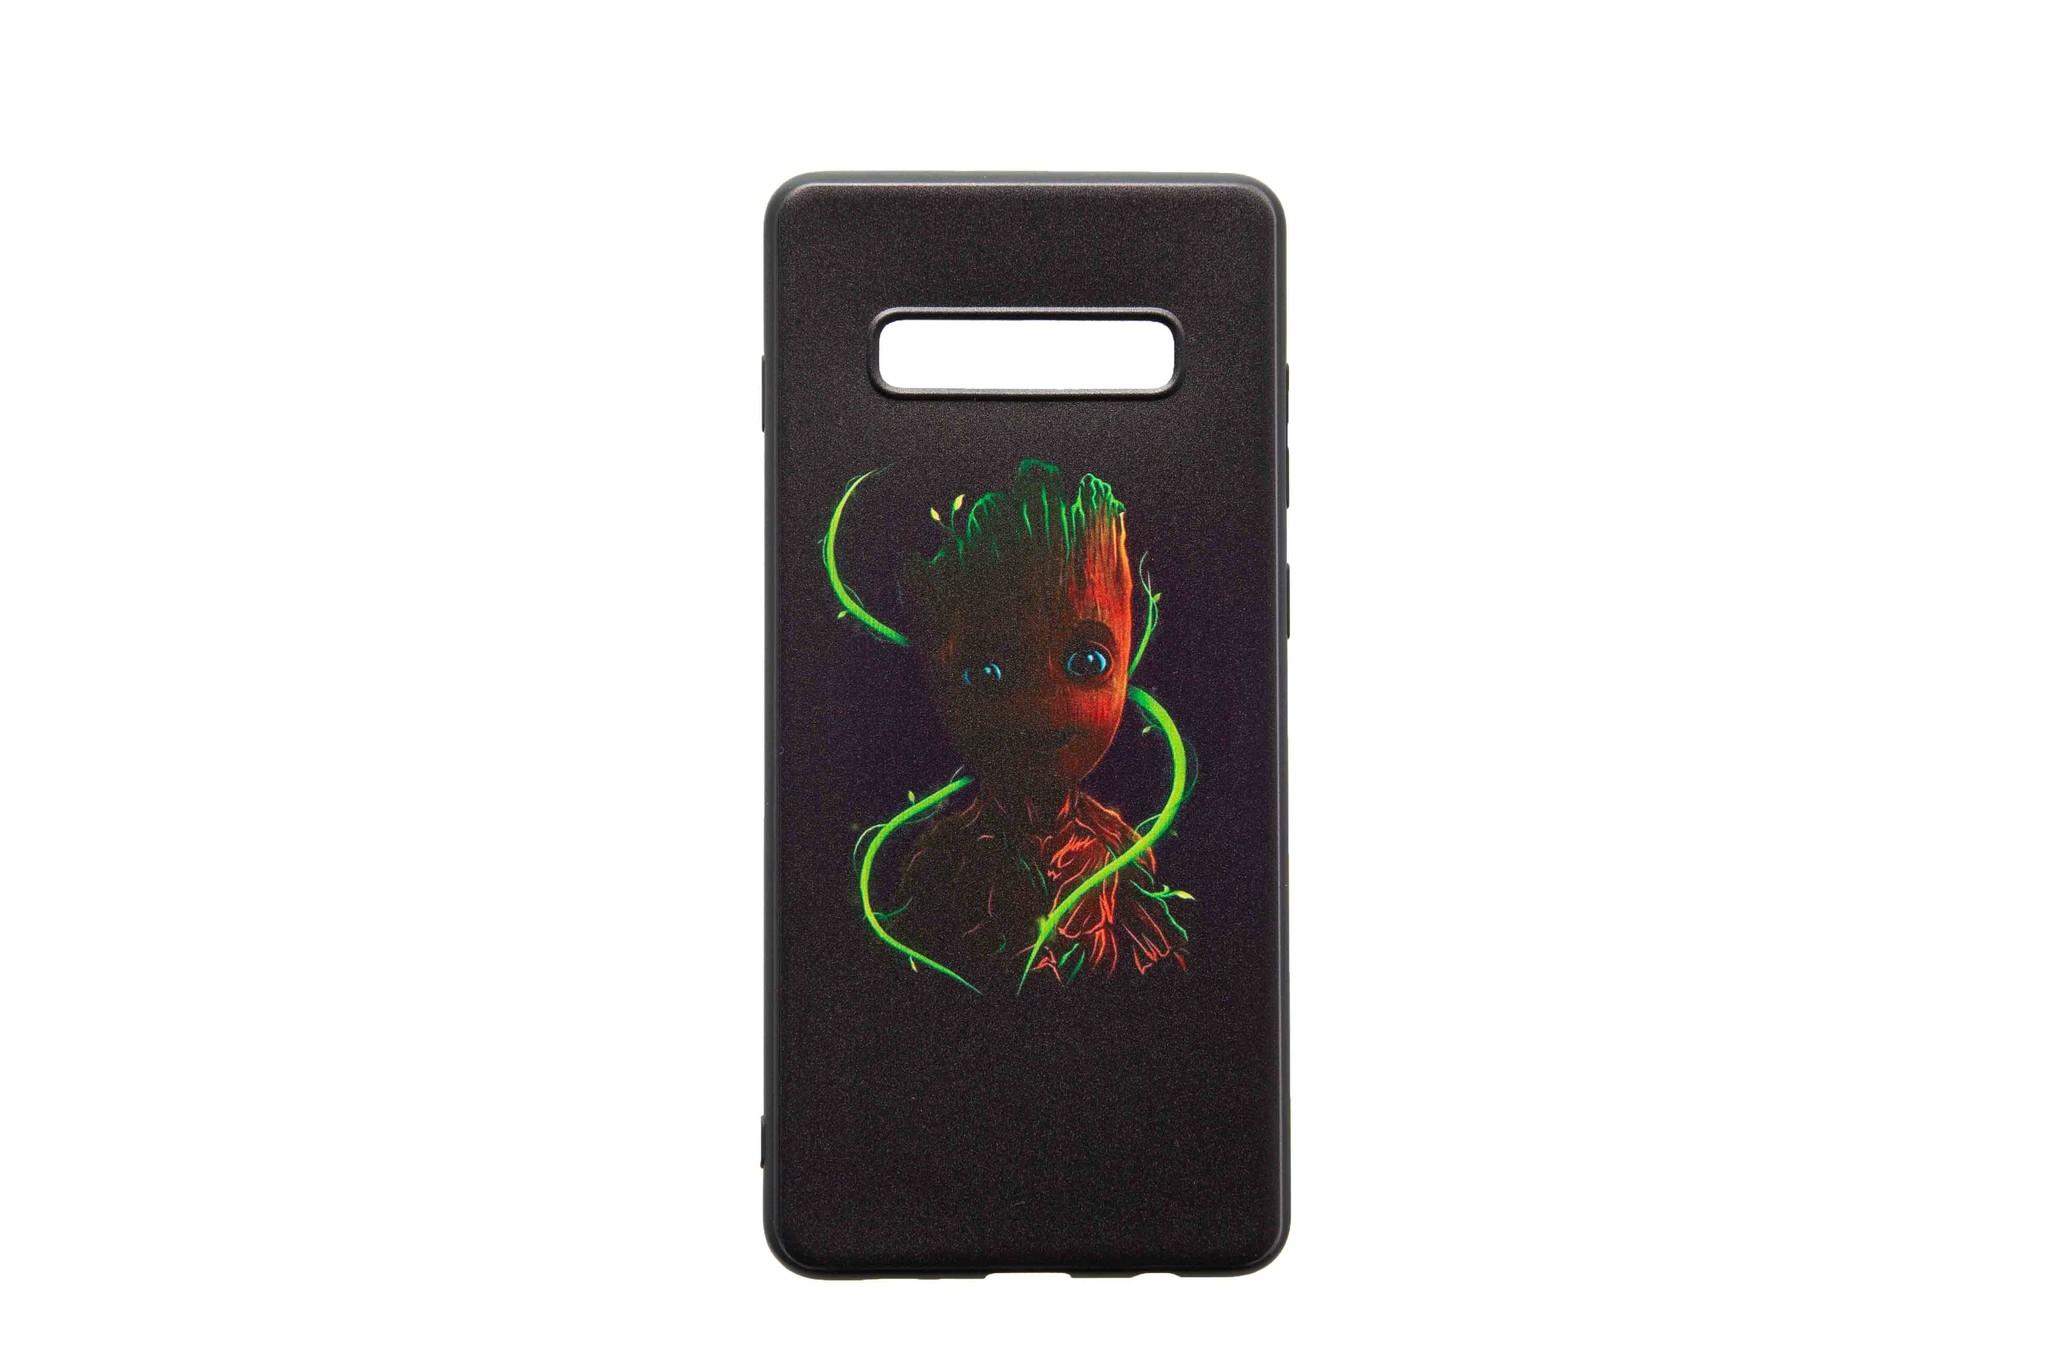 Smartphonehoesje iPhone 7 plus / 8 plus | Marvel (Groot)